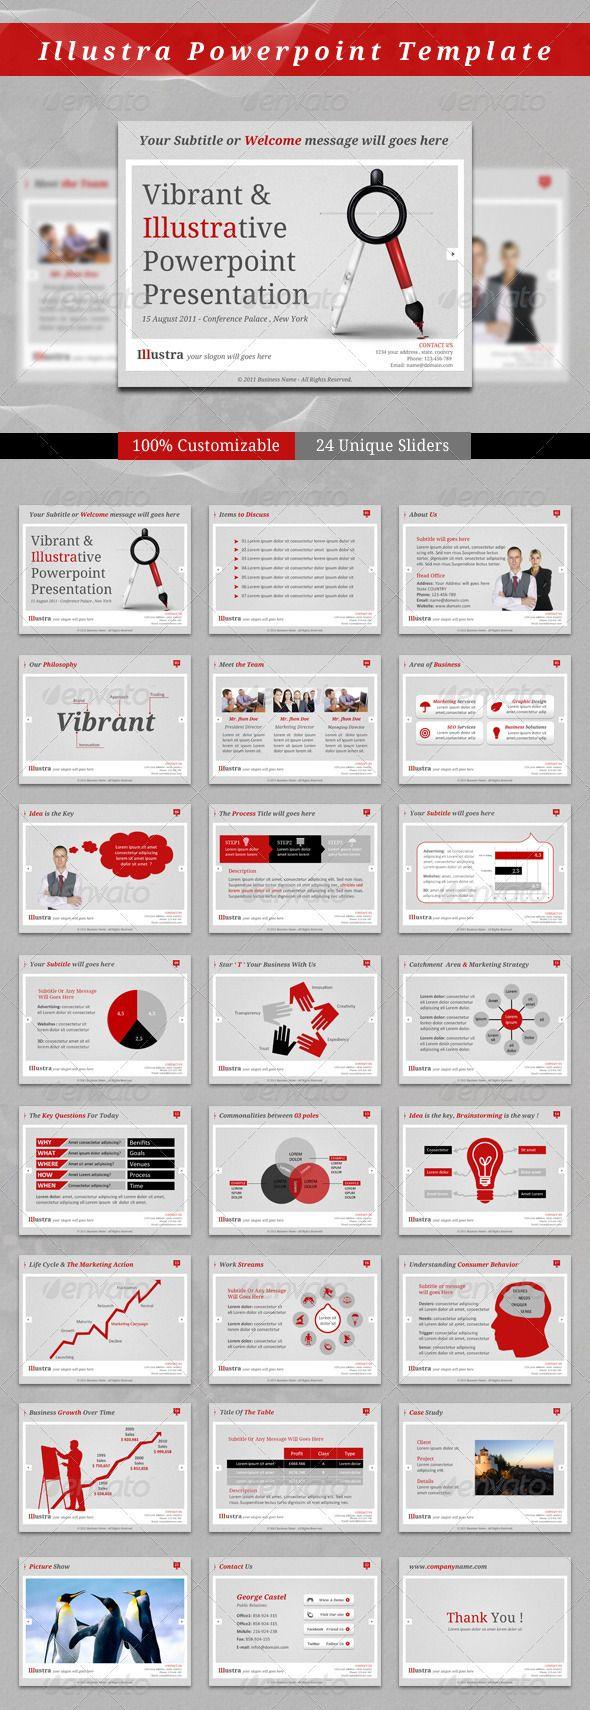 PowerPoint template for BPMN  acidumde